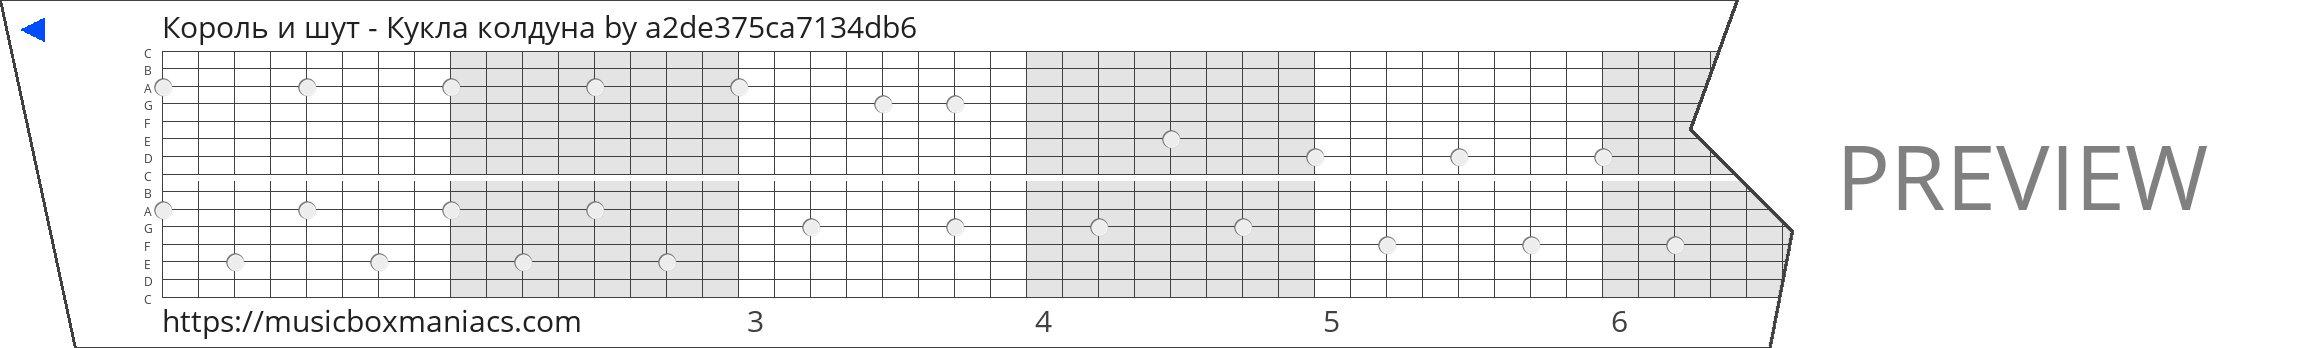 Король и шут - Кукла колдуна 15 note music box paper strip